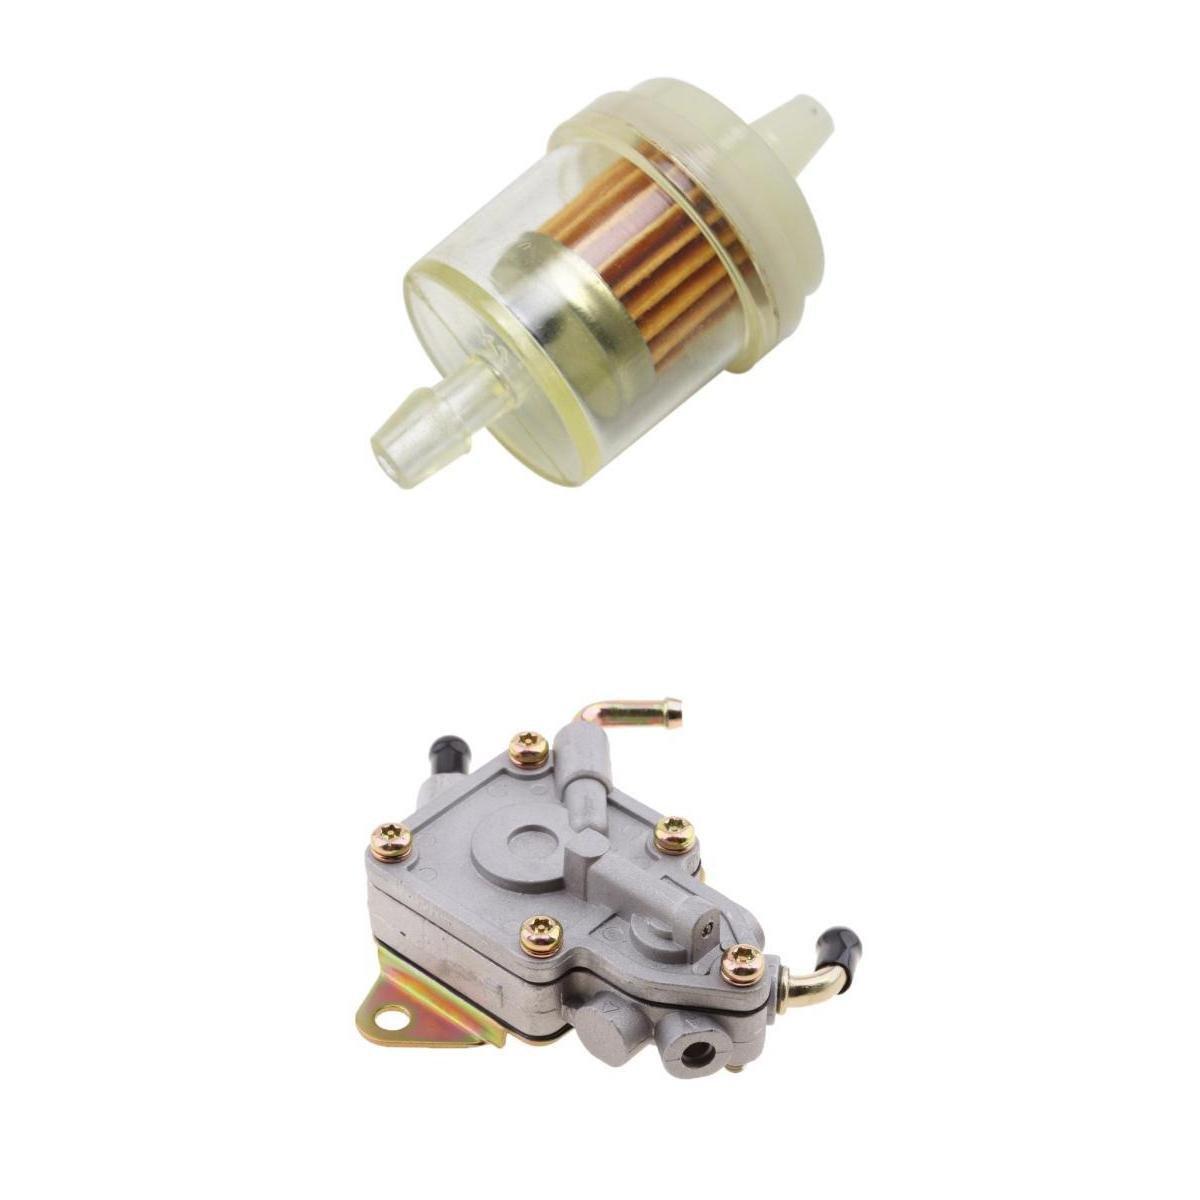 hight resolution of baoblaze fuel pump filter for yamaha rhino 450 660 utv 5ug 13910 01